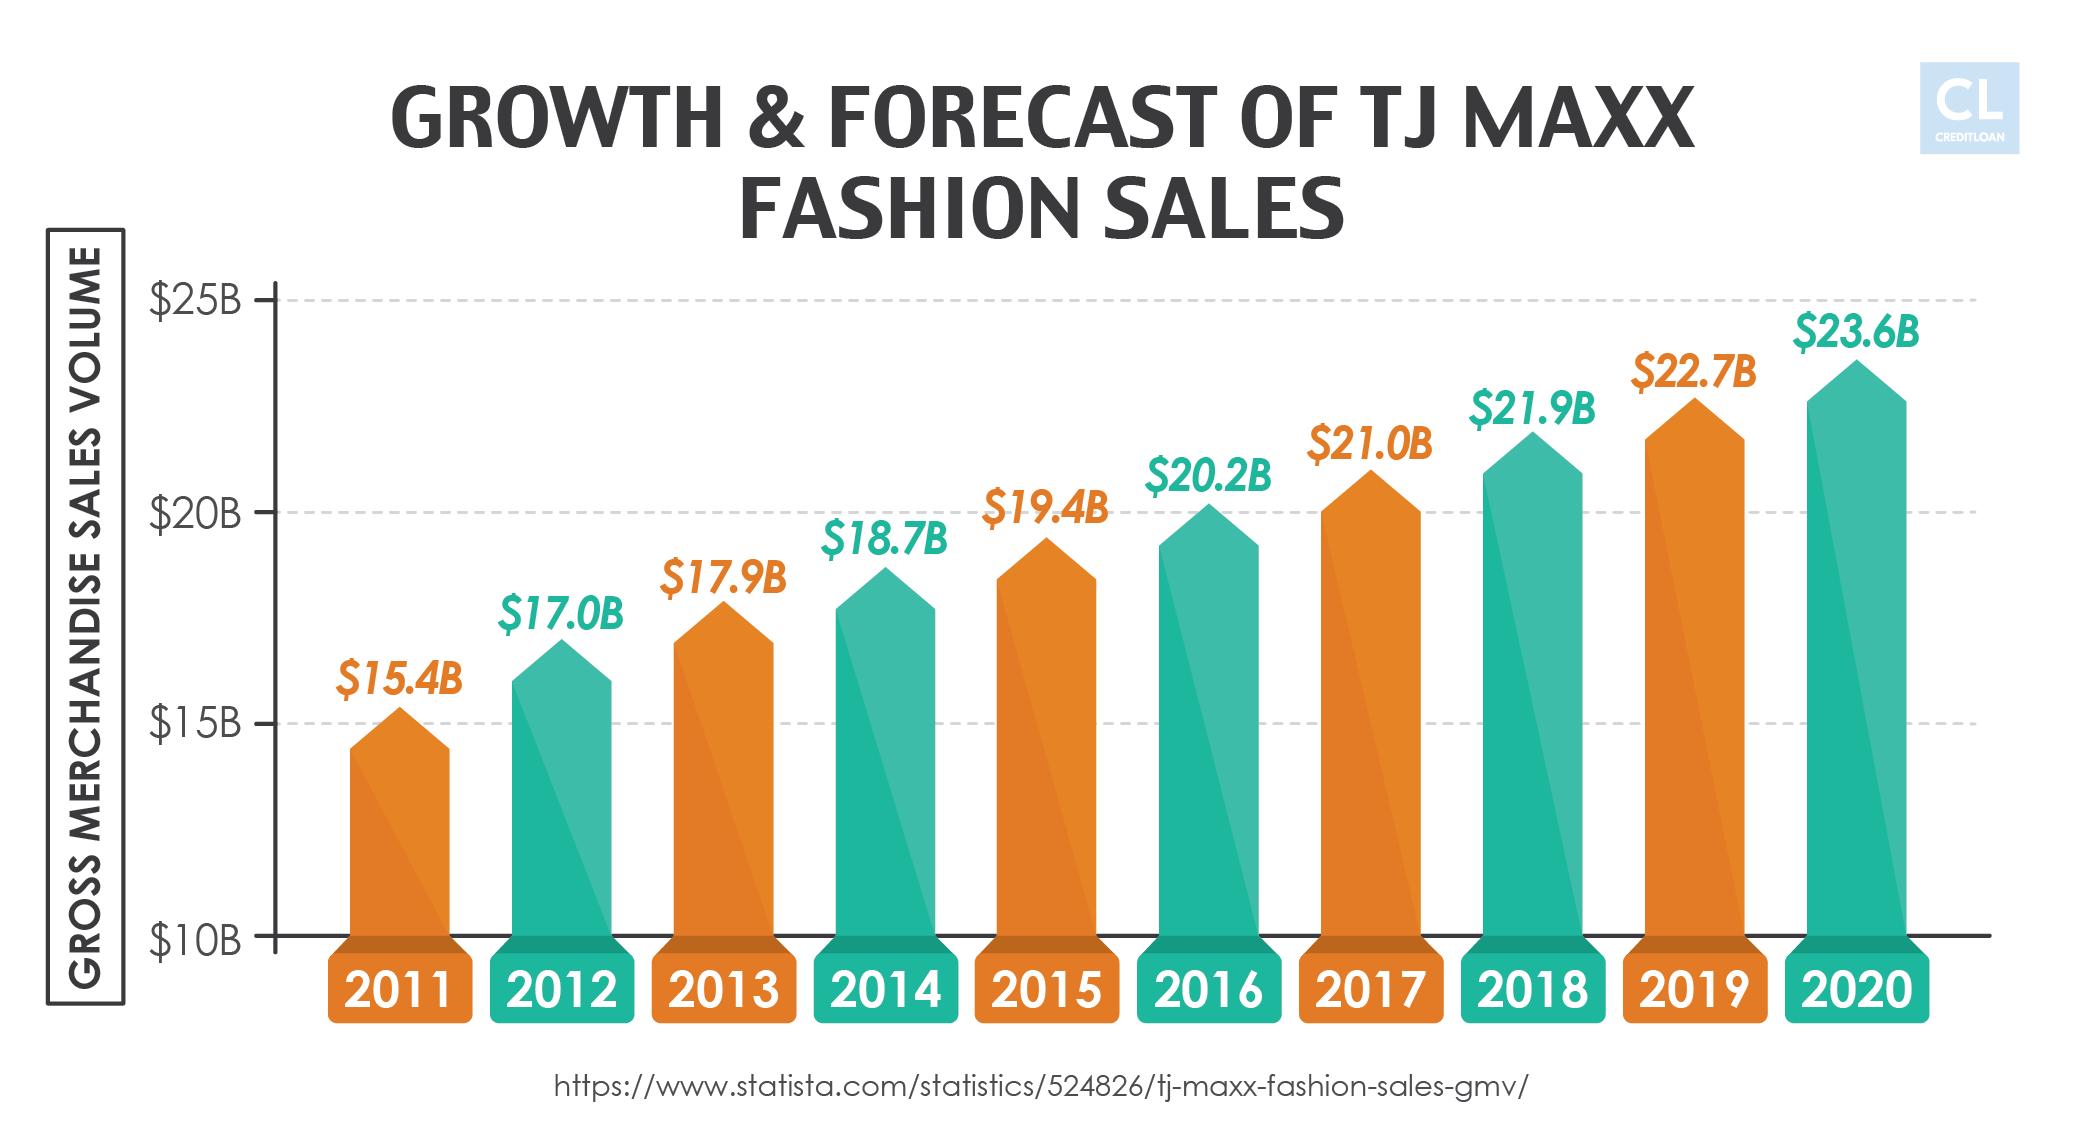 Growth & Forecast of TJ Maxx Fashion Sales from 2011-2020